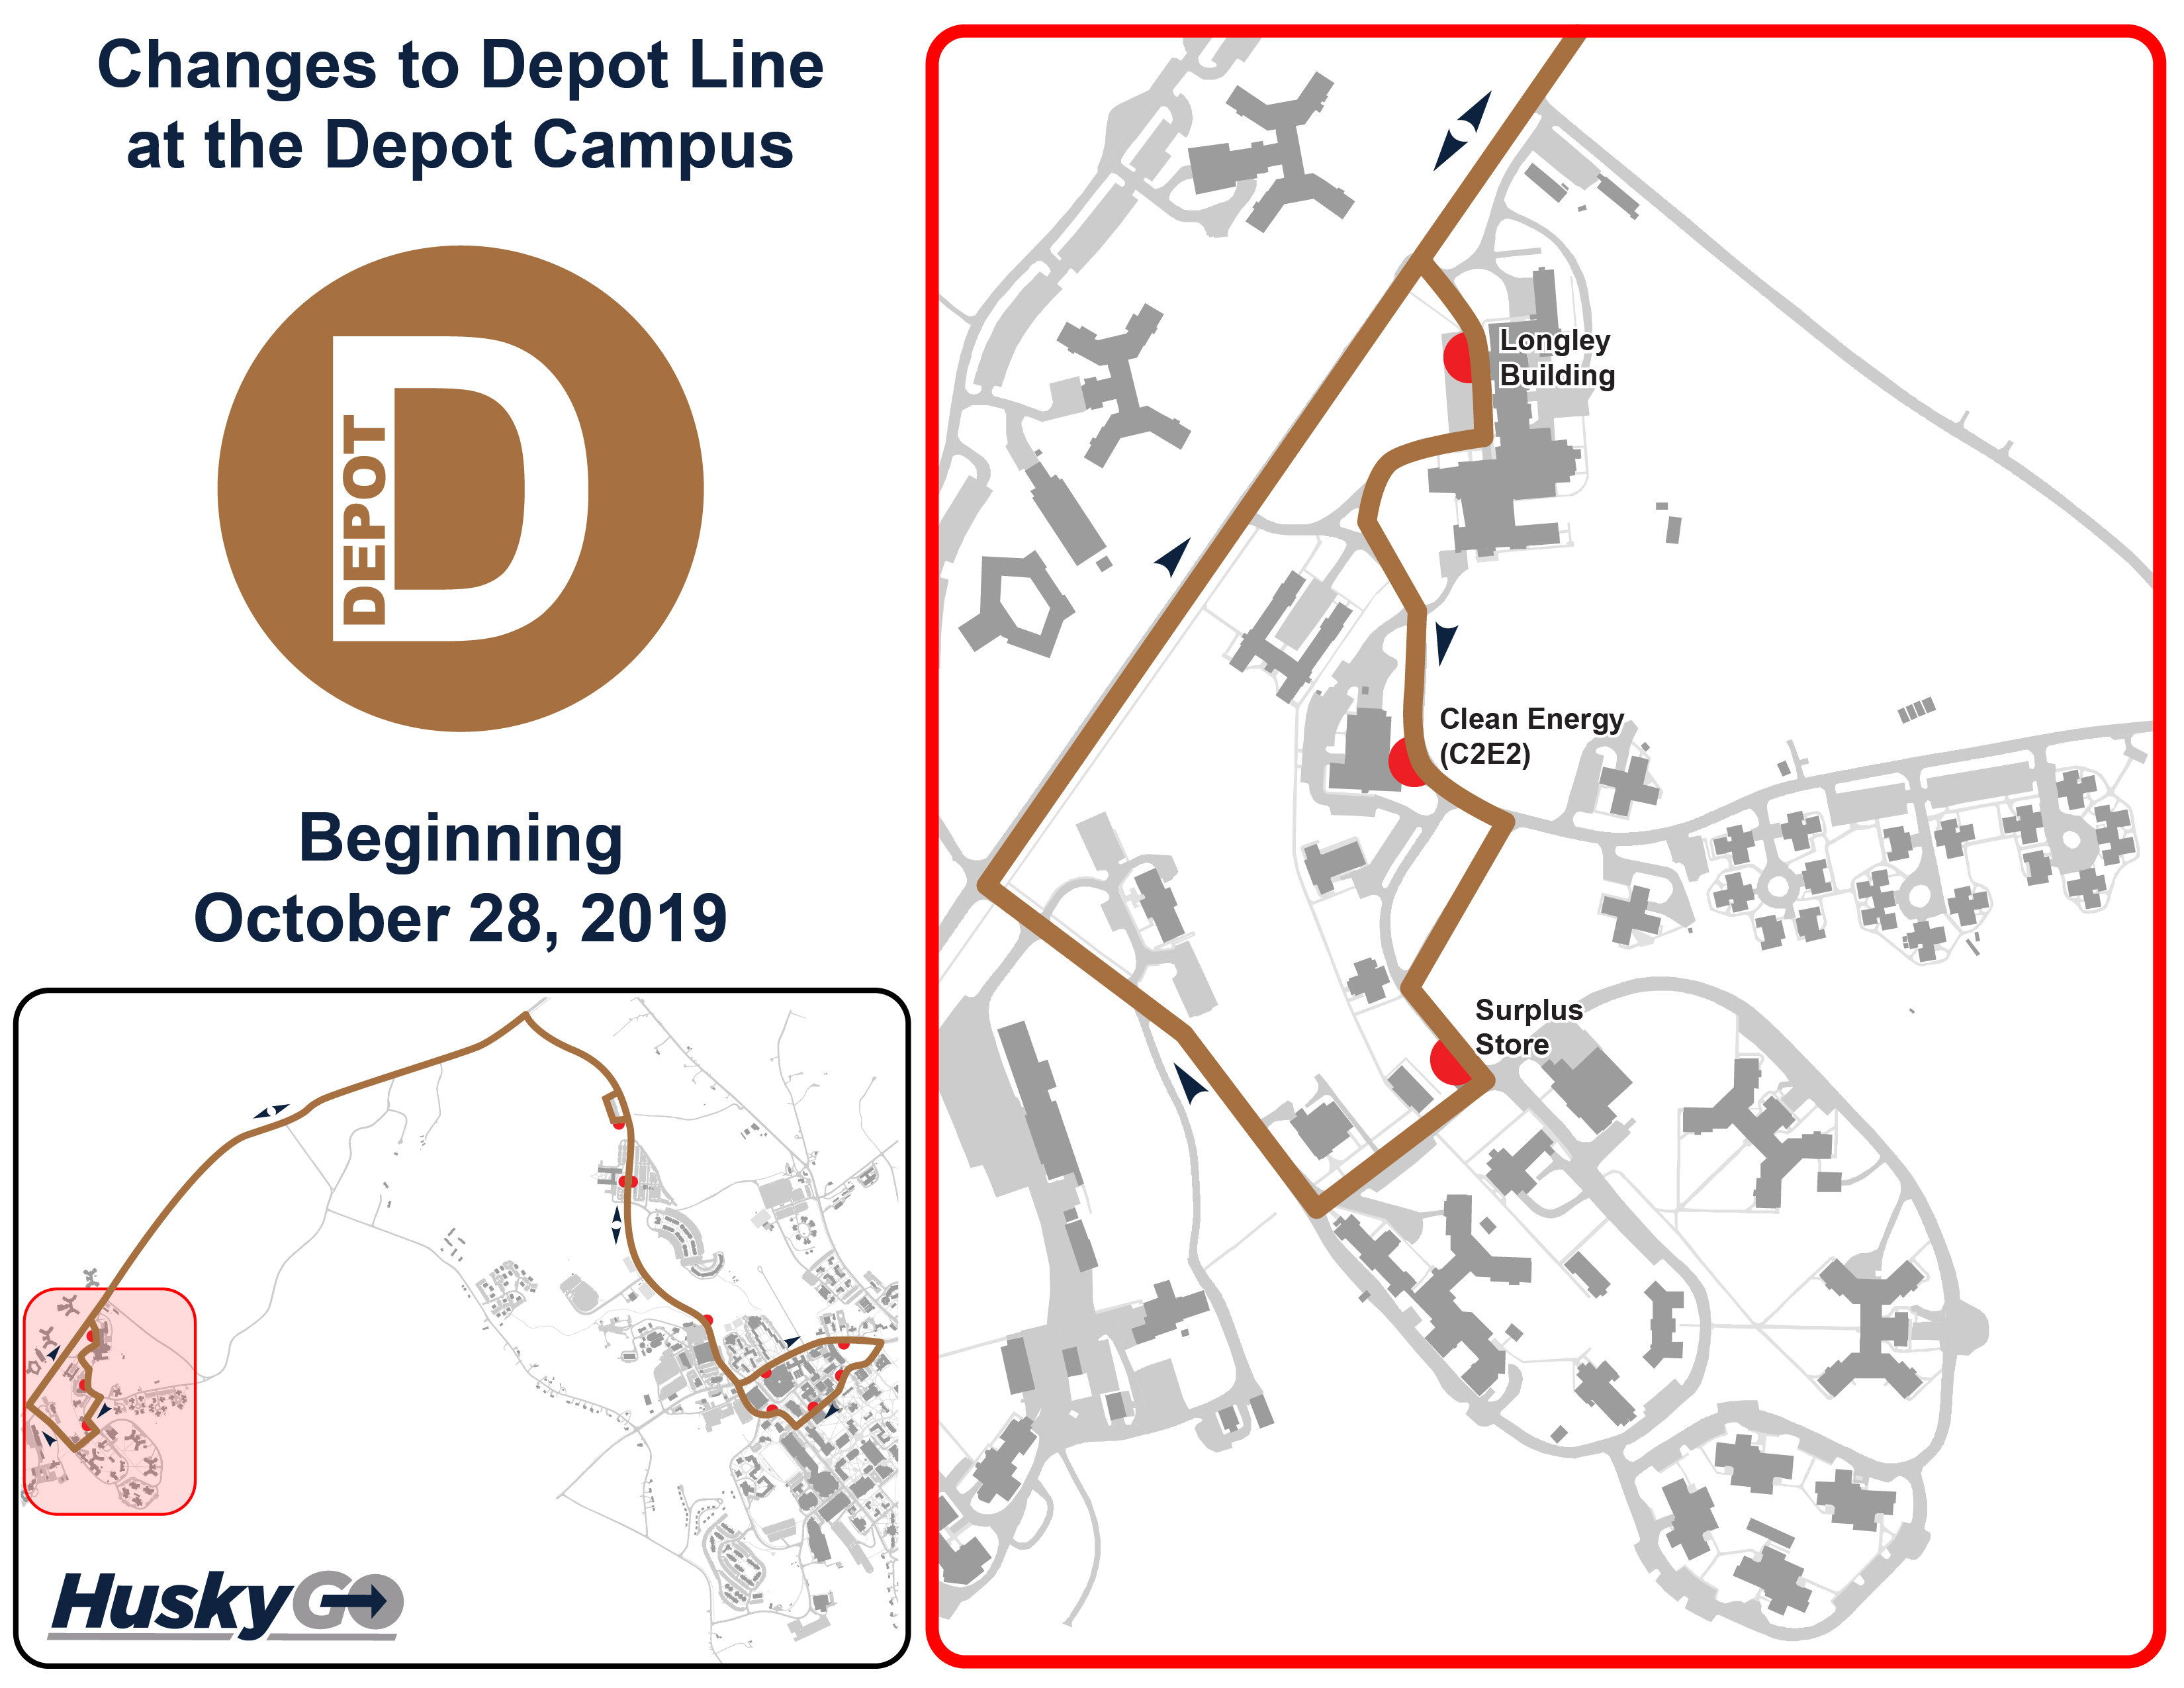 uconn depot campus map 10 28 Changes To Depot Line Transportation Services